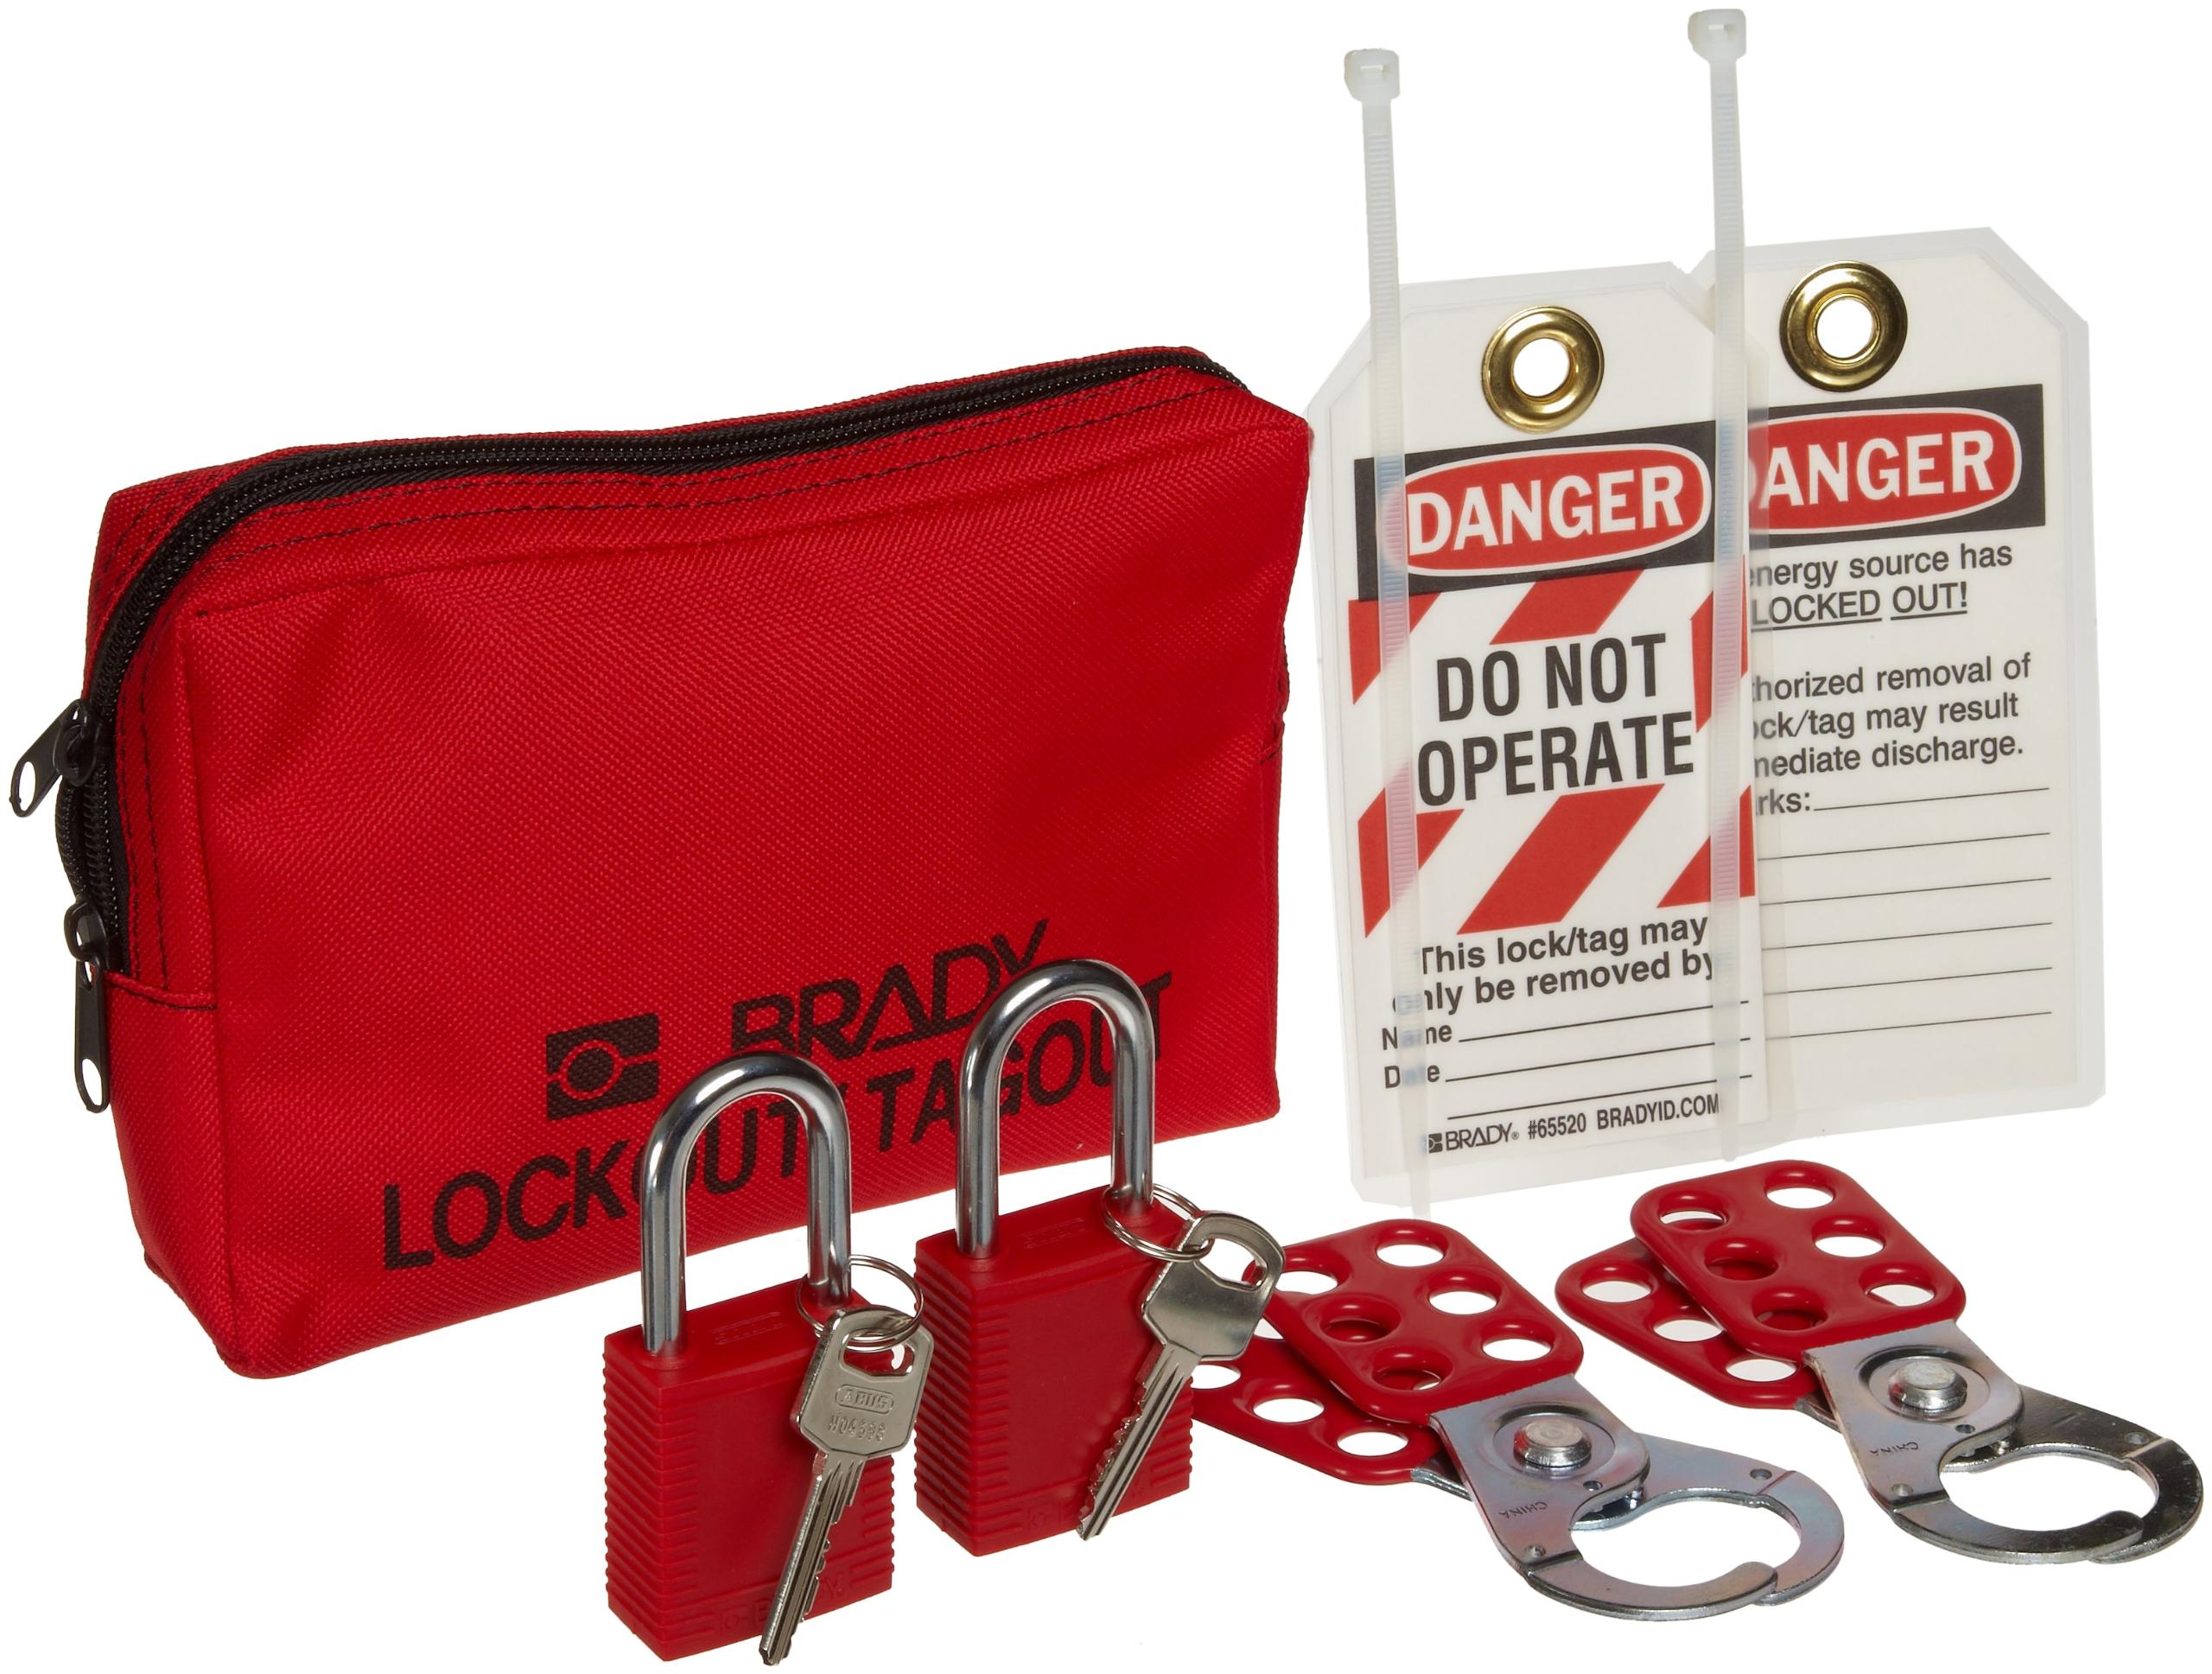 Brady Personal Lockout Tagout Pouch Kit - 105969 by Brady